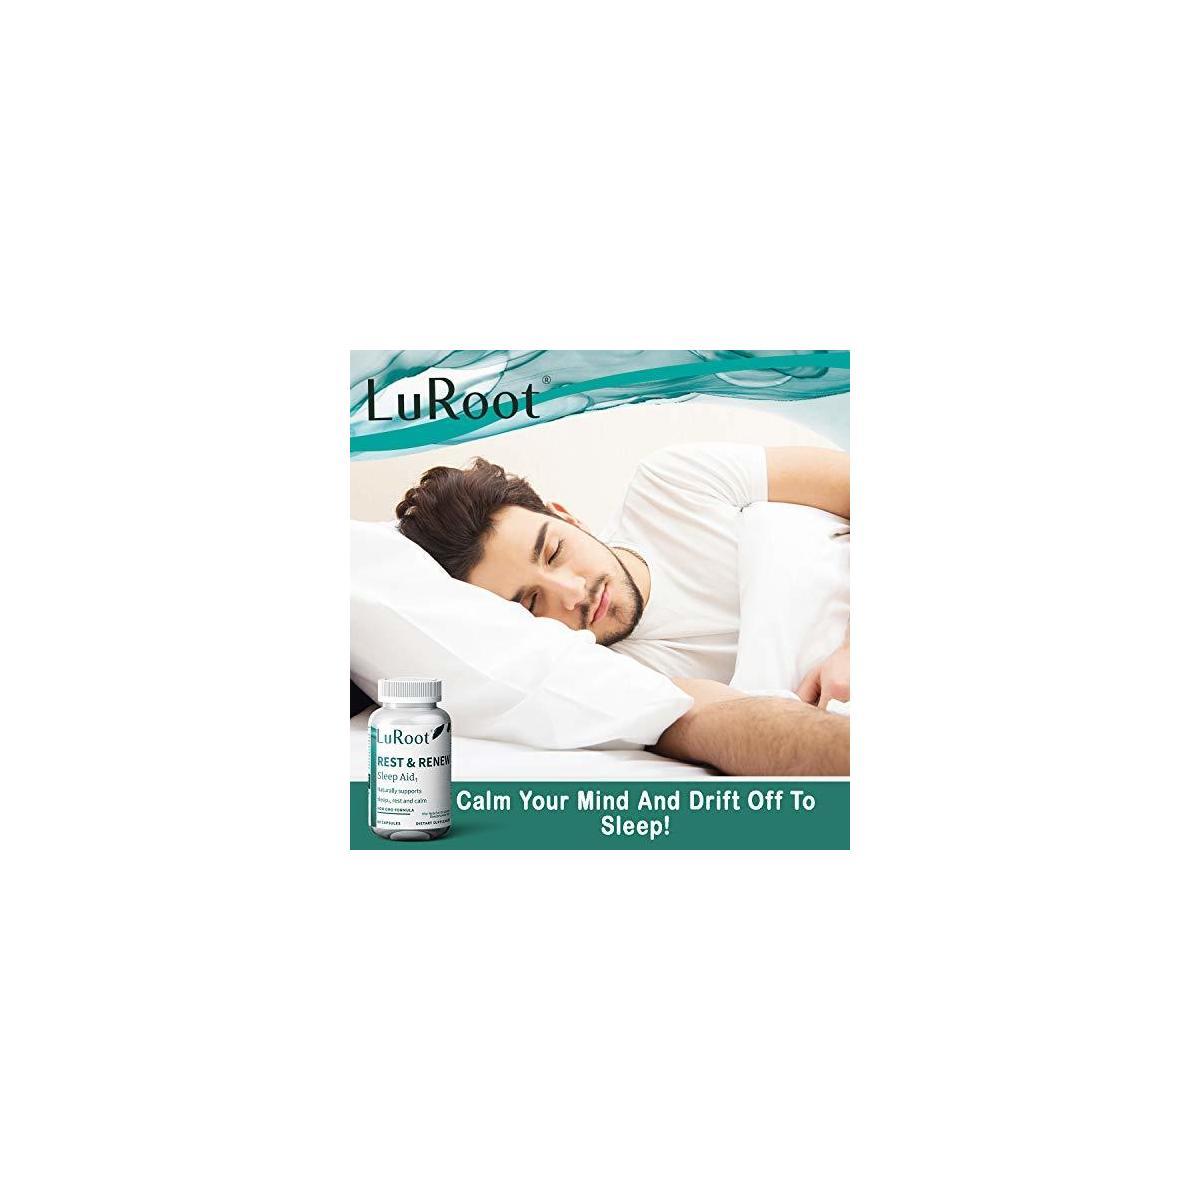 Luroot Herbal Sleep Aid for Adults - 60 Non Habit Sleep Aid Capsules - Natural Aid for Deeper Sleep - Natural Sleep Aid Supplement with Melatonin, GABA, 5-HTP, L-Theanine for Restful Deep Sleep Aid